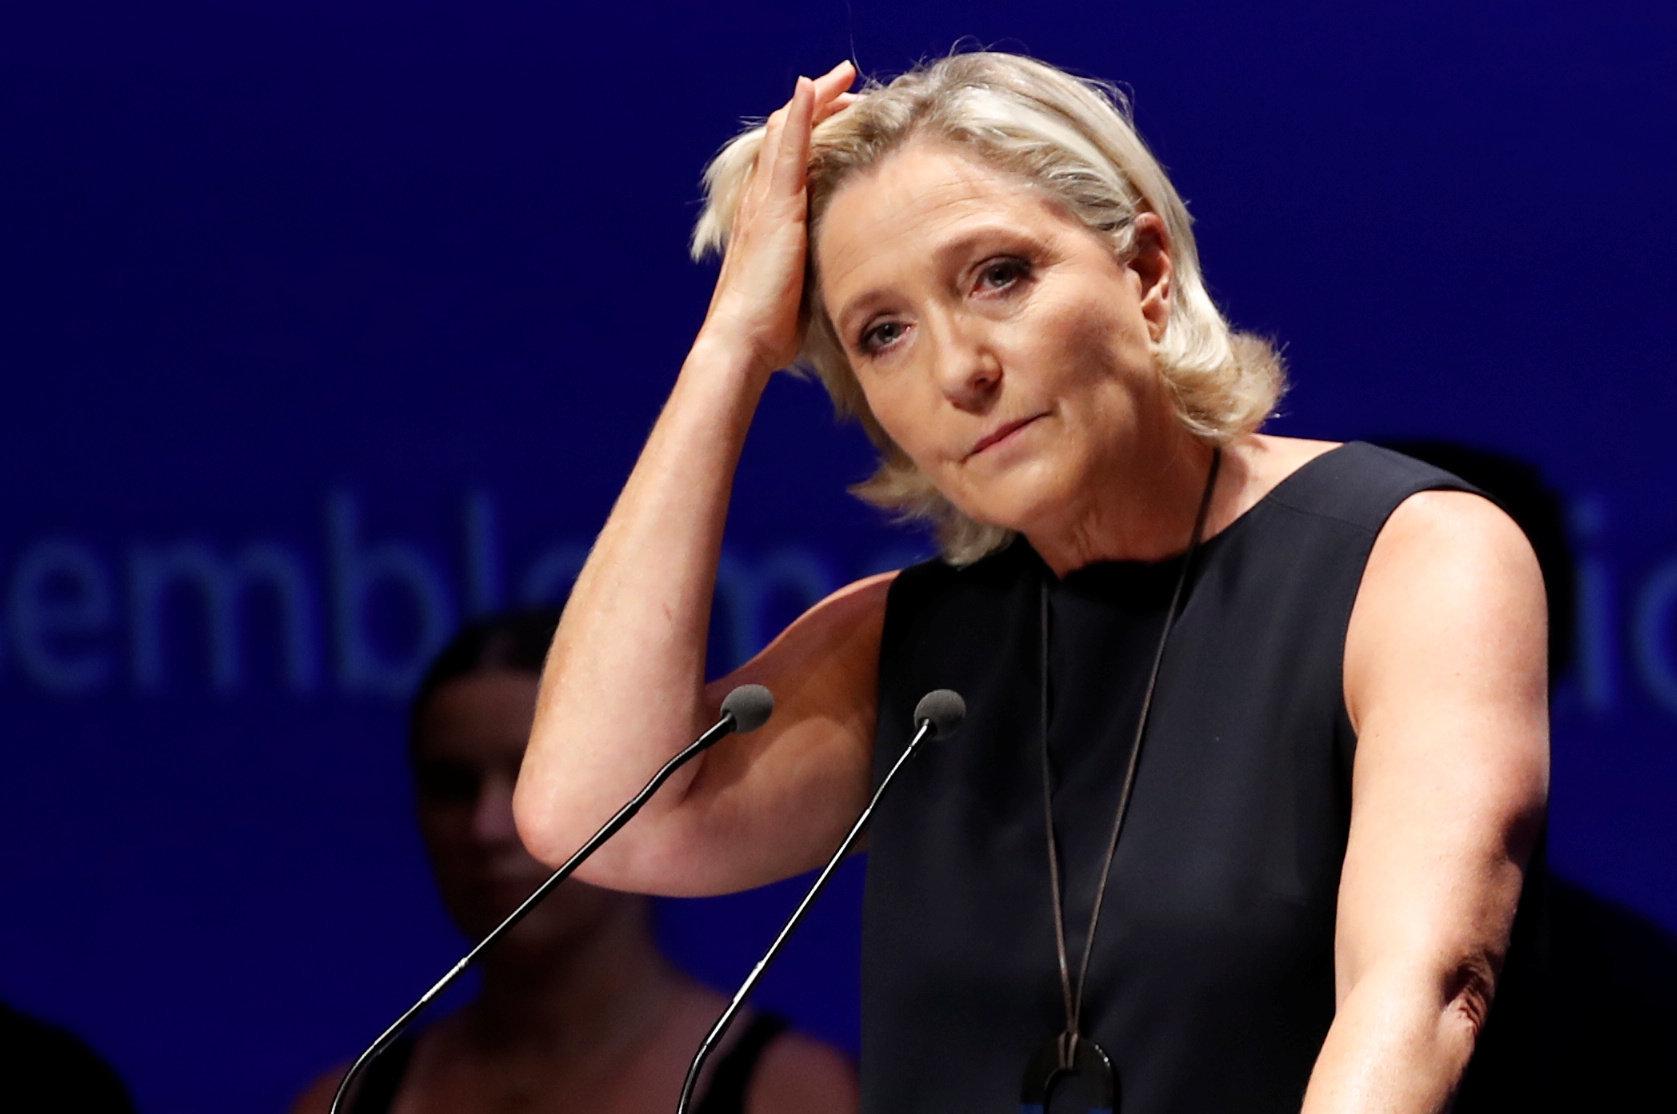 Marine Le Pen Refuses To Undergo Court-Ordered Psychiatric